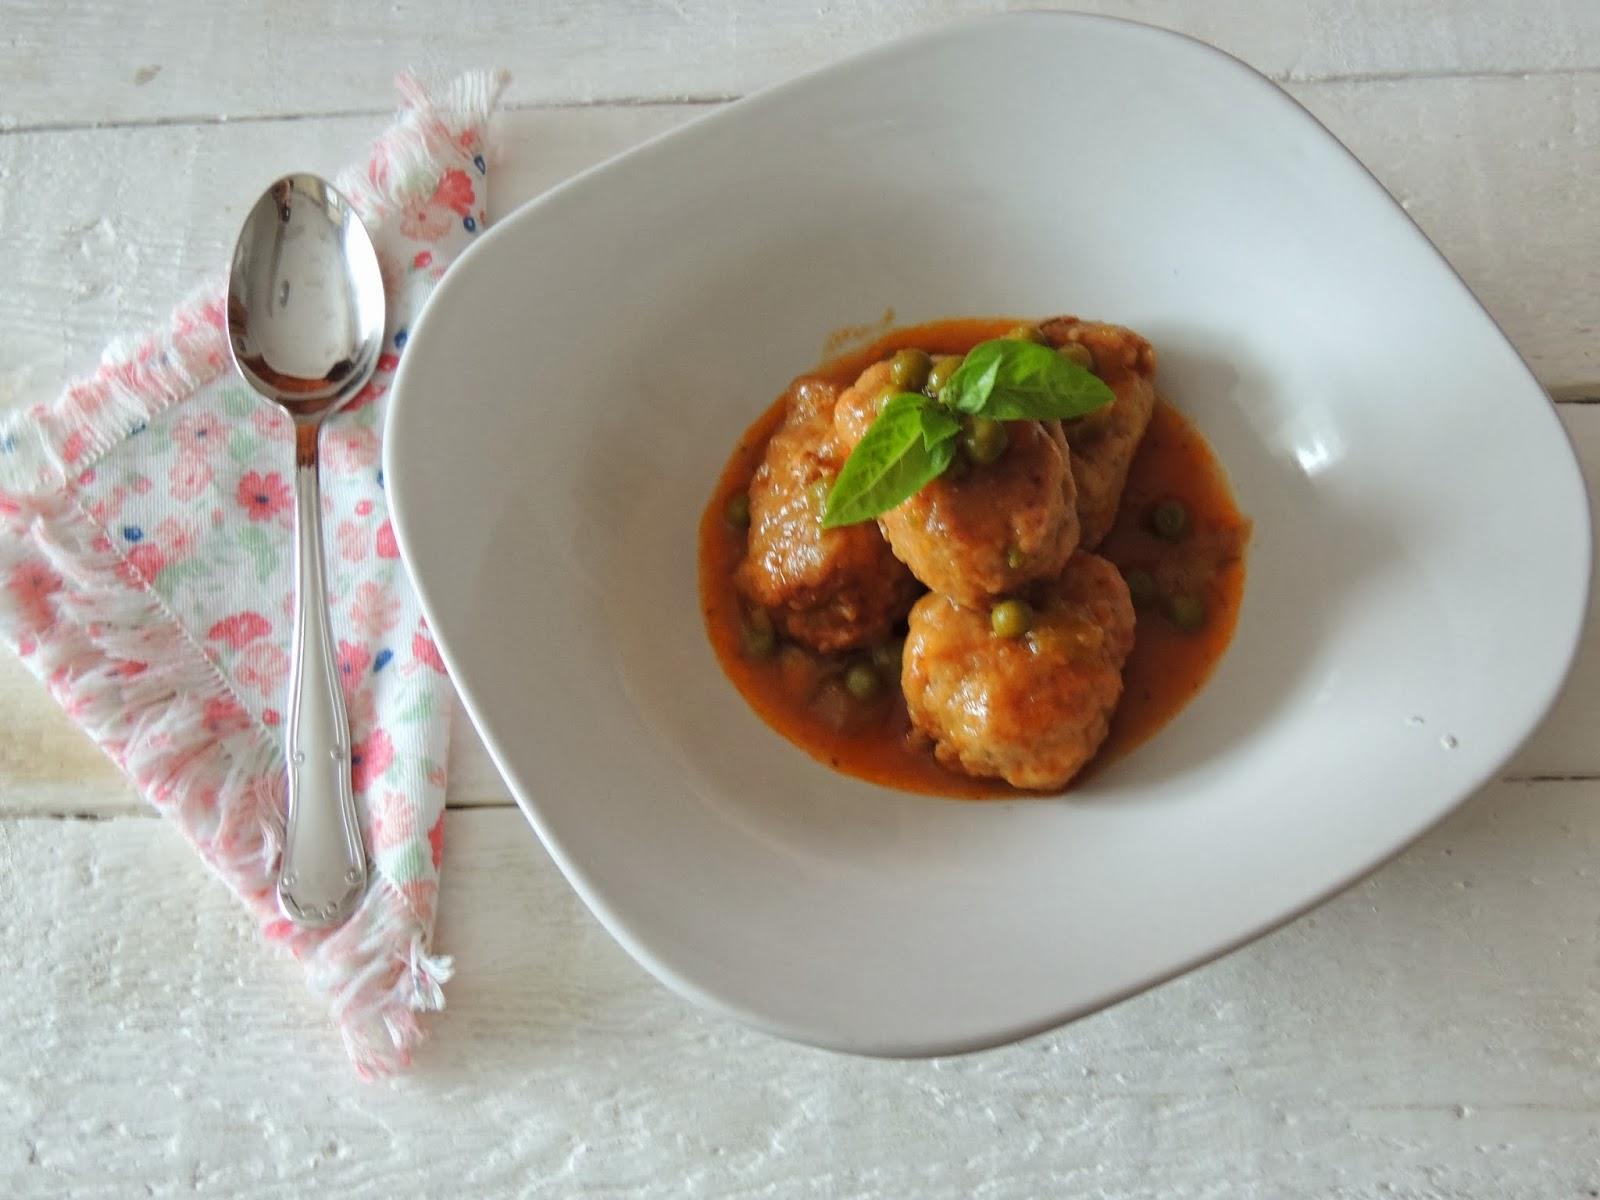 Alb ndigas de pollo ligeras en salsa de pedro xim nez - Acompanamiento para albondigas ...